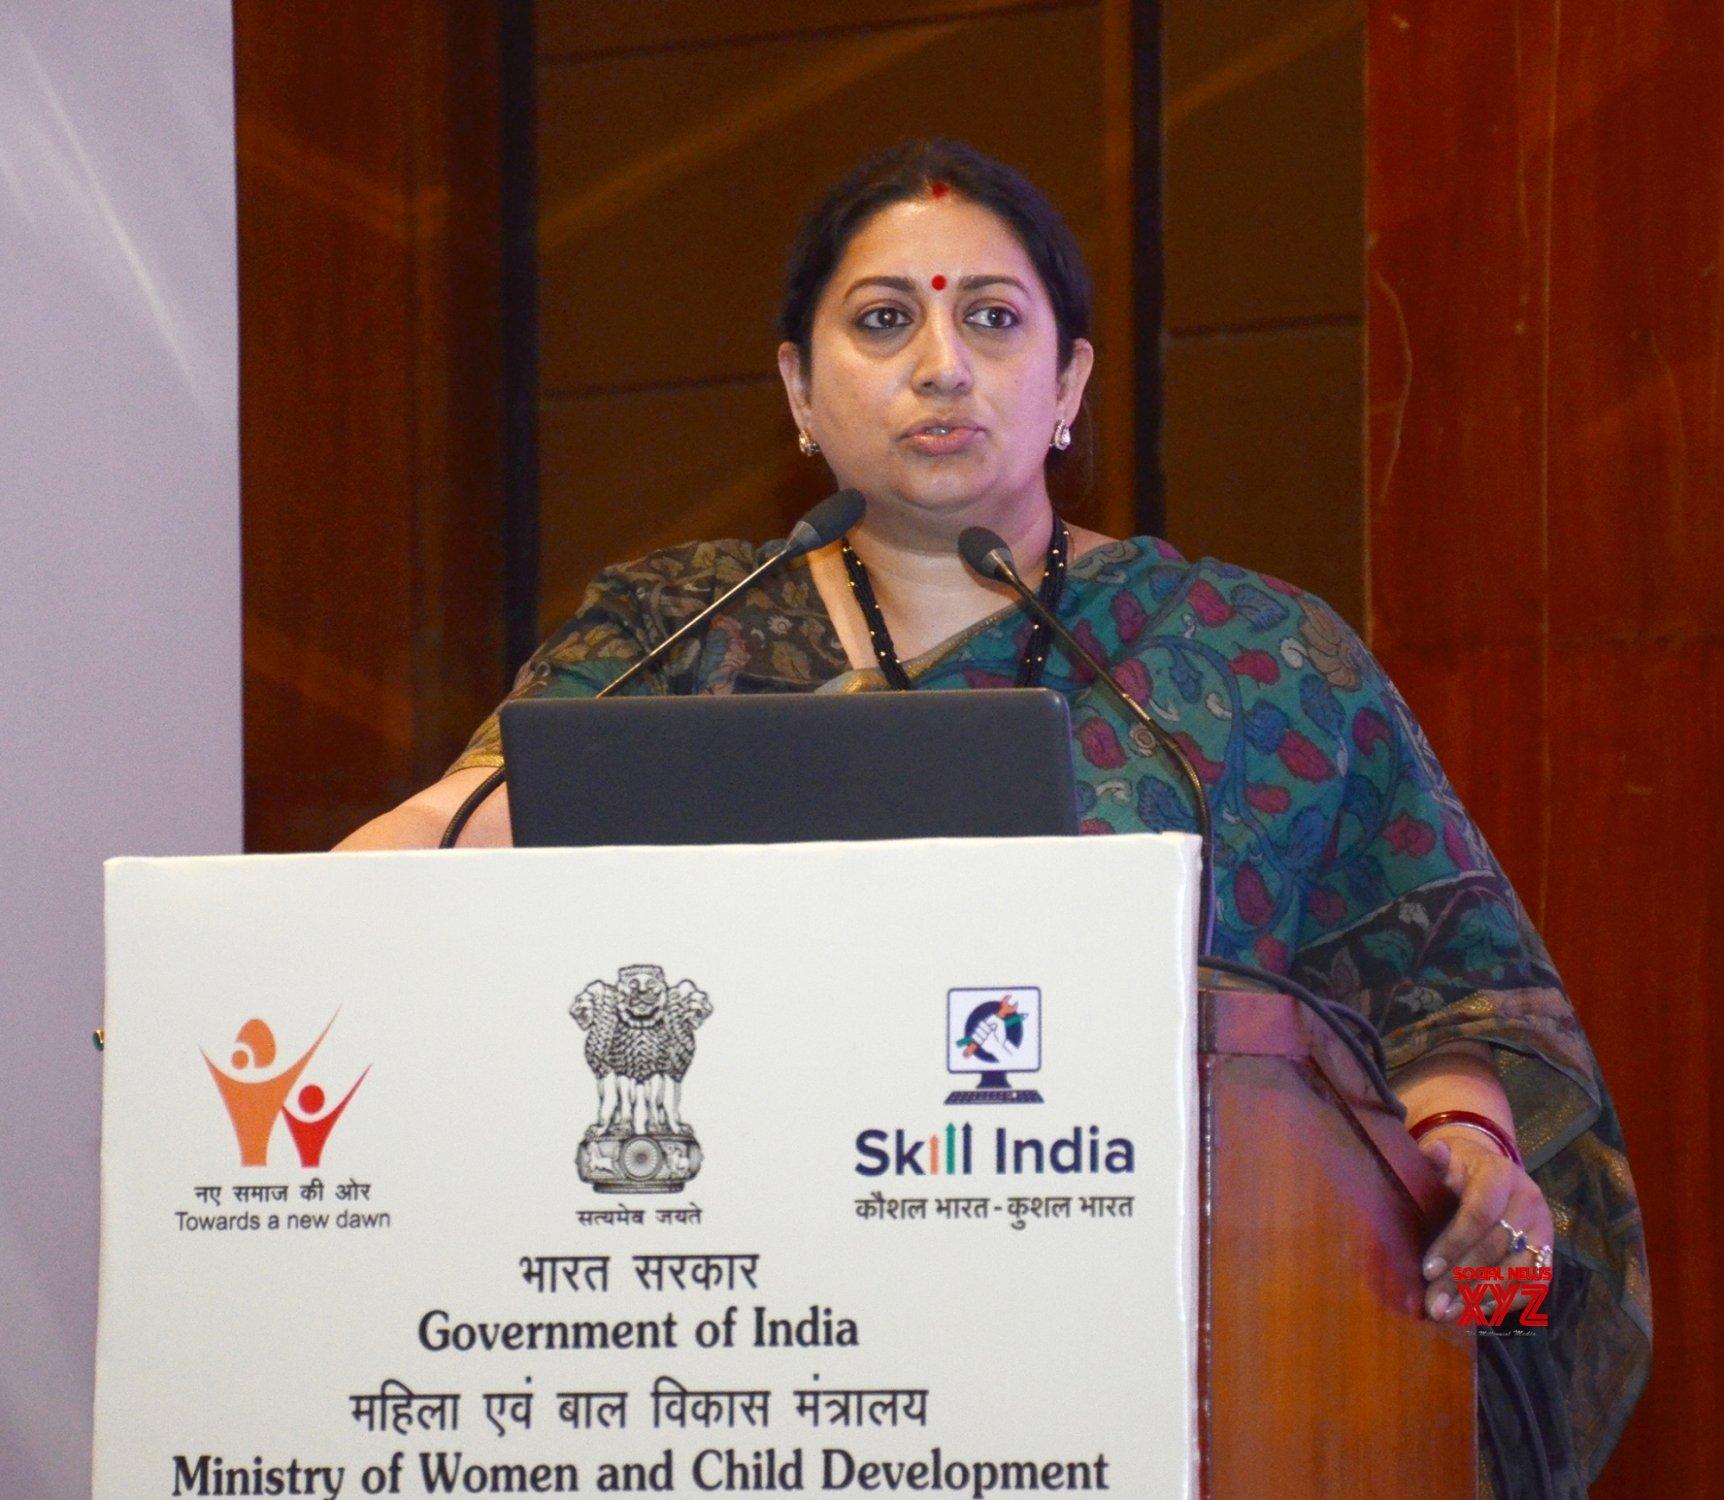 New Delhi: Union Minister Smriti Irani addresses at the valedictory session #Gallery